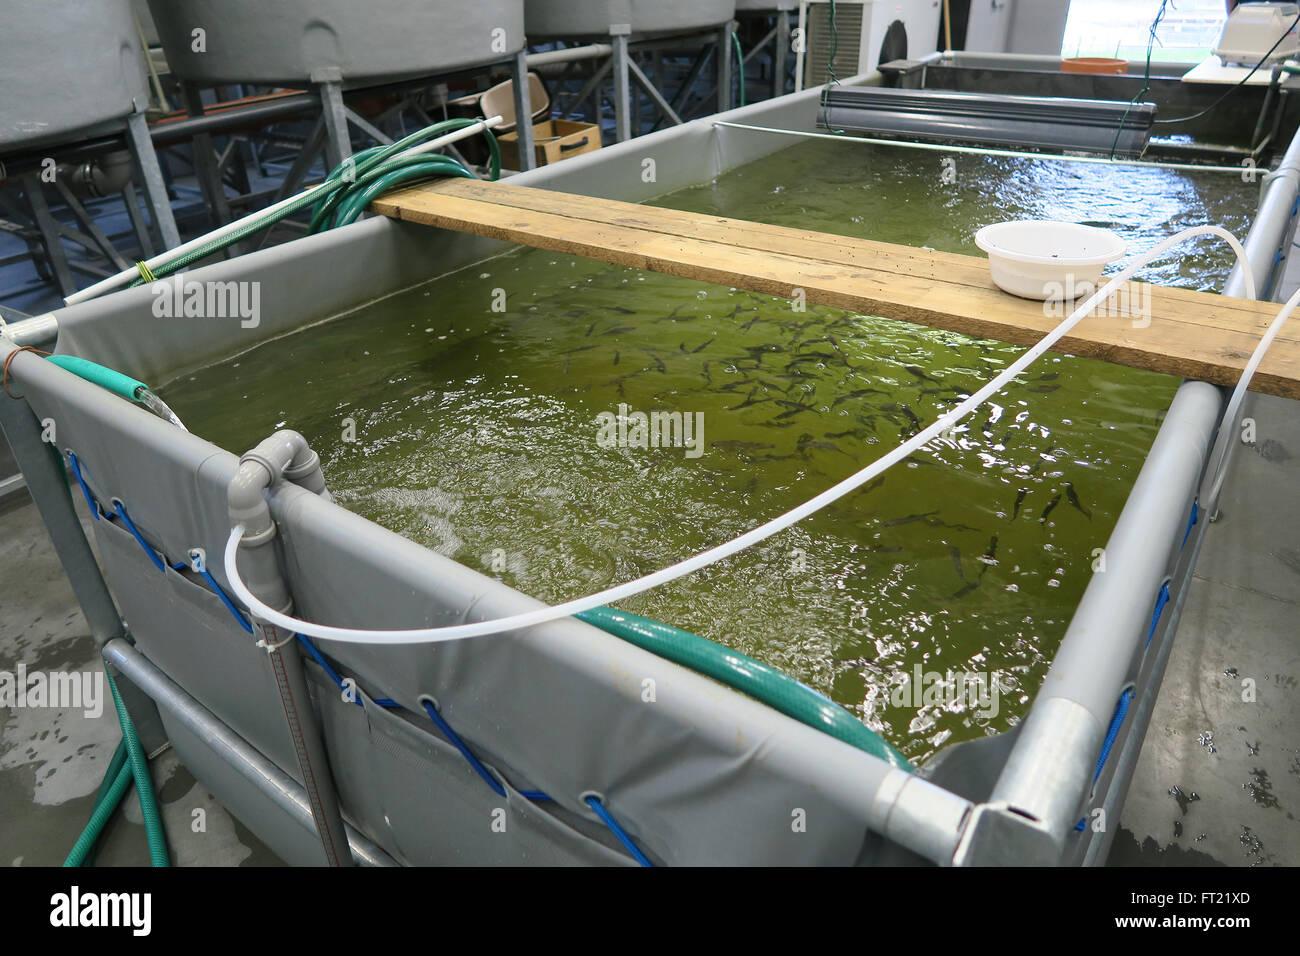 Indoor aquaculture tanks Stock Photo: 100849013 - Alamy